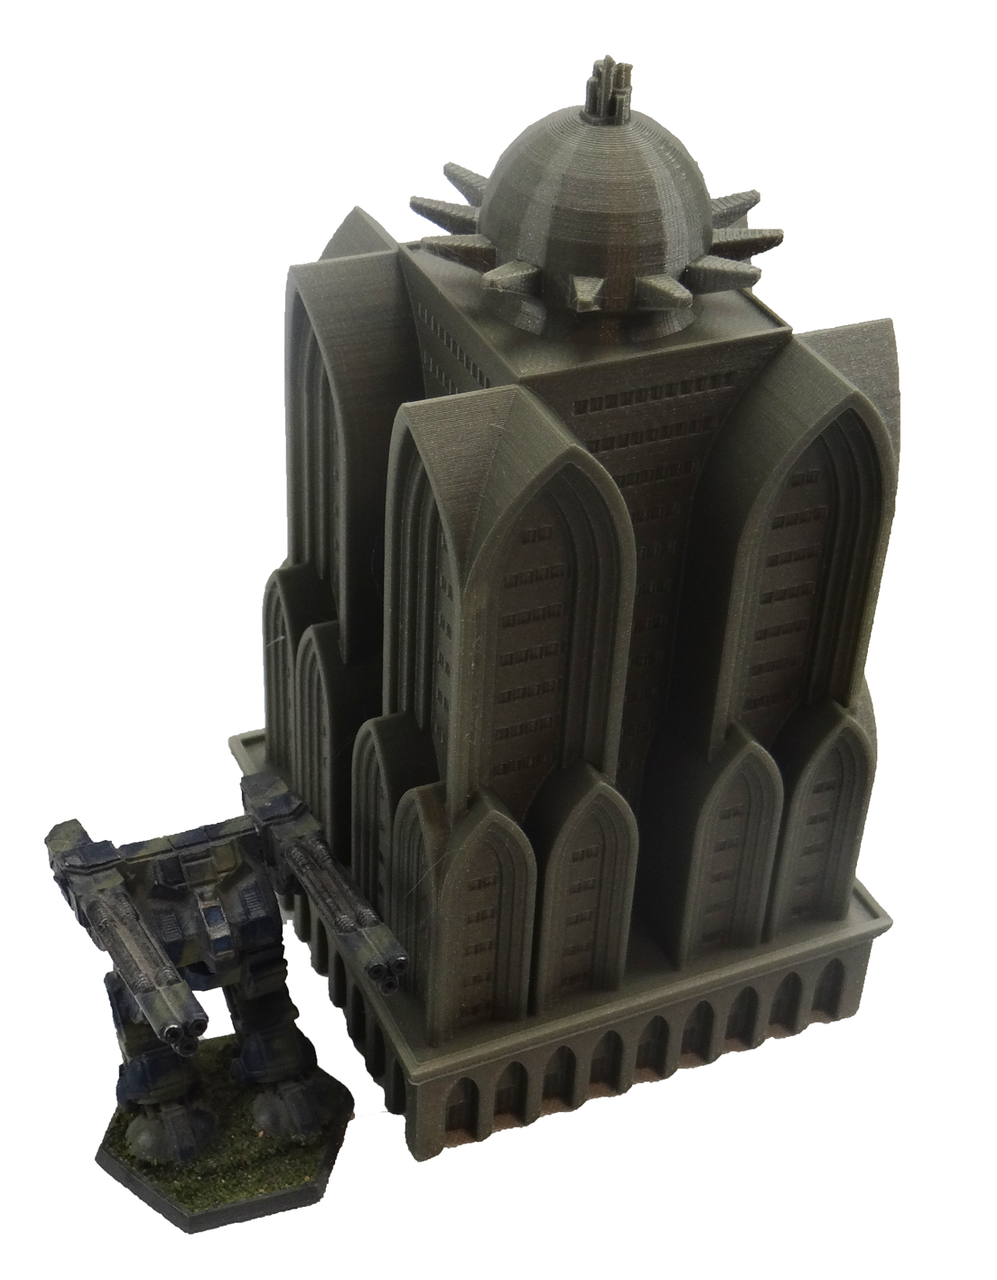 1366 Imperium Barracks with Battletech Mech view